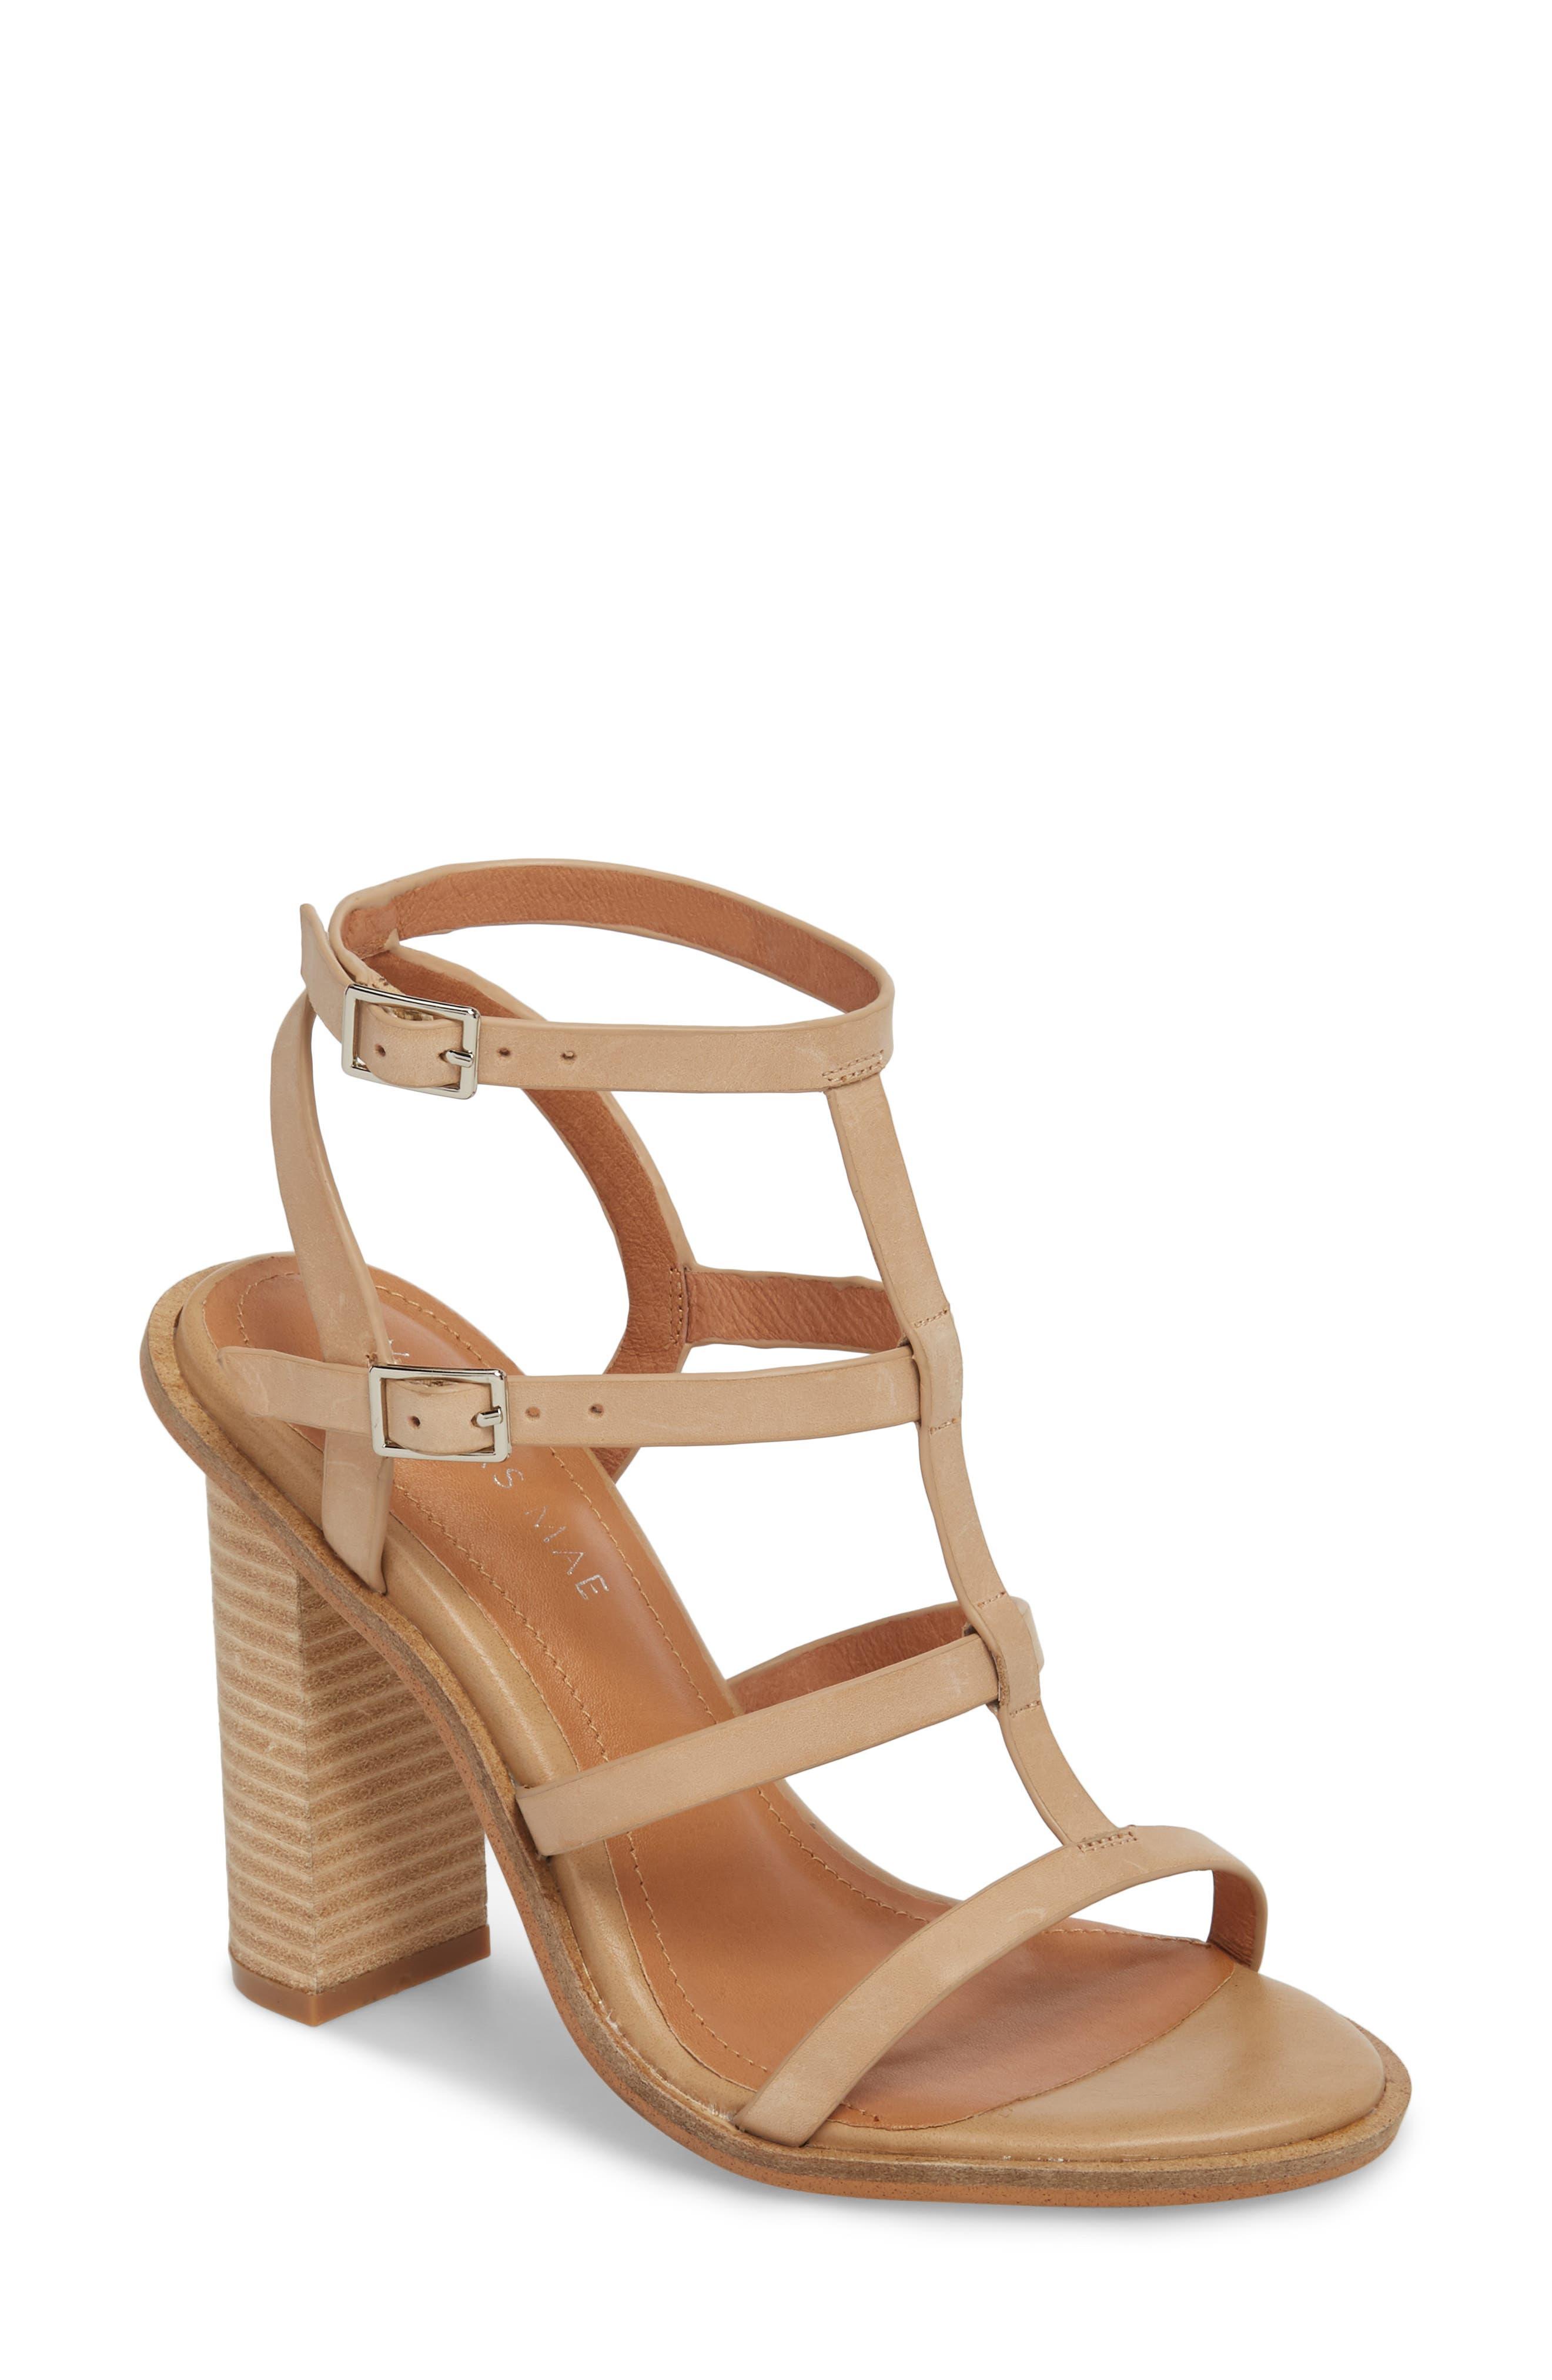 Adios Sandal,                         Main,                         color, Natural Leather